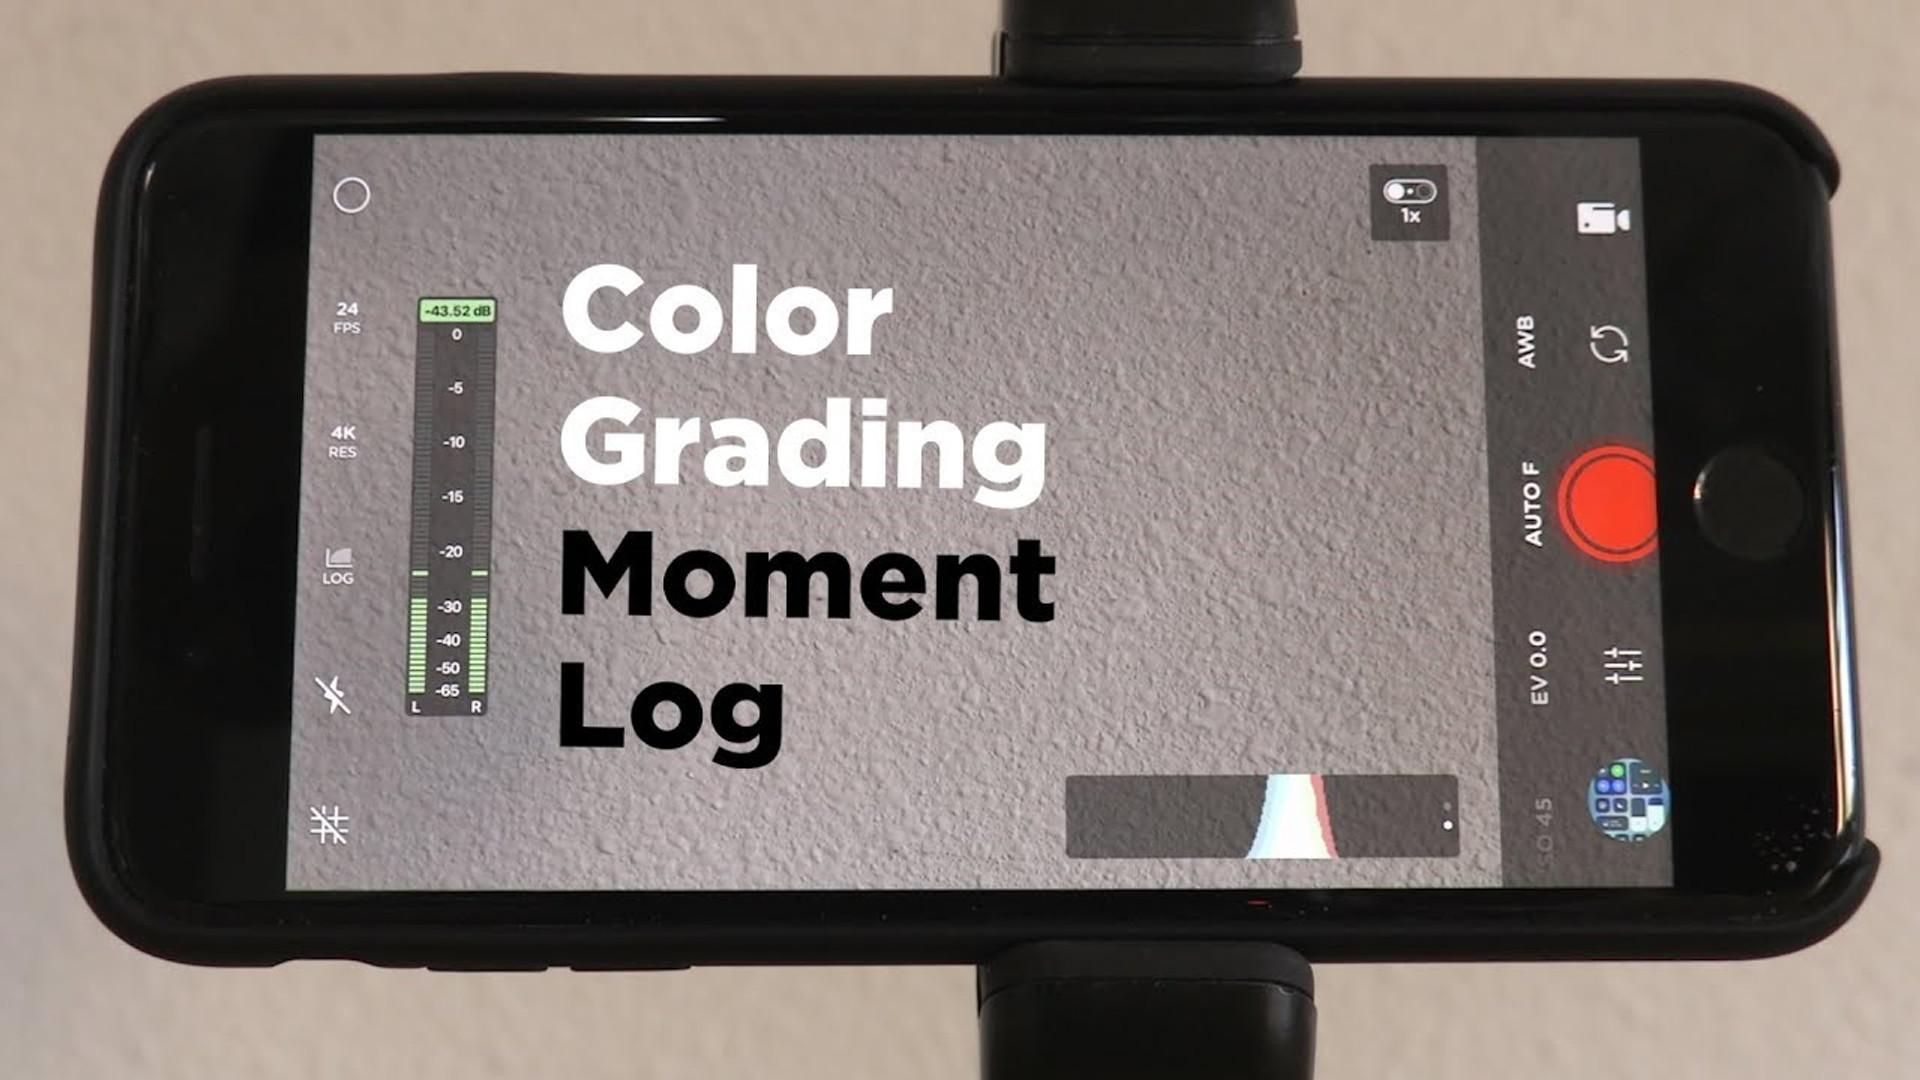 Color Grading Moment Log Footage